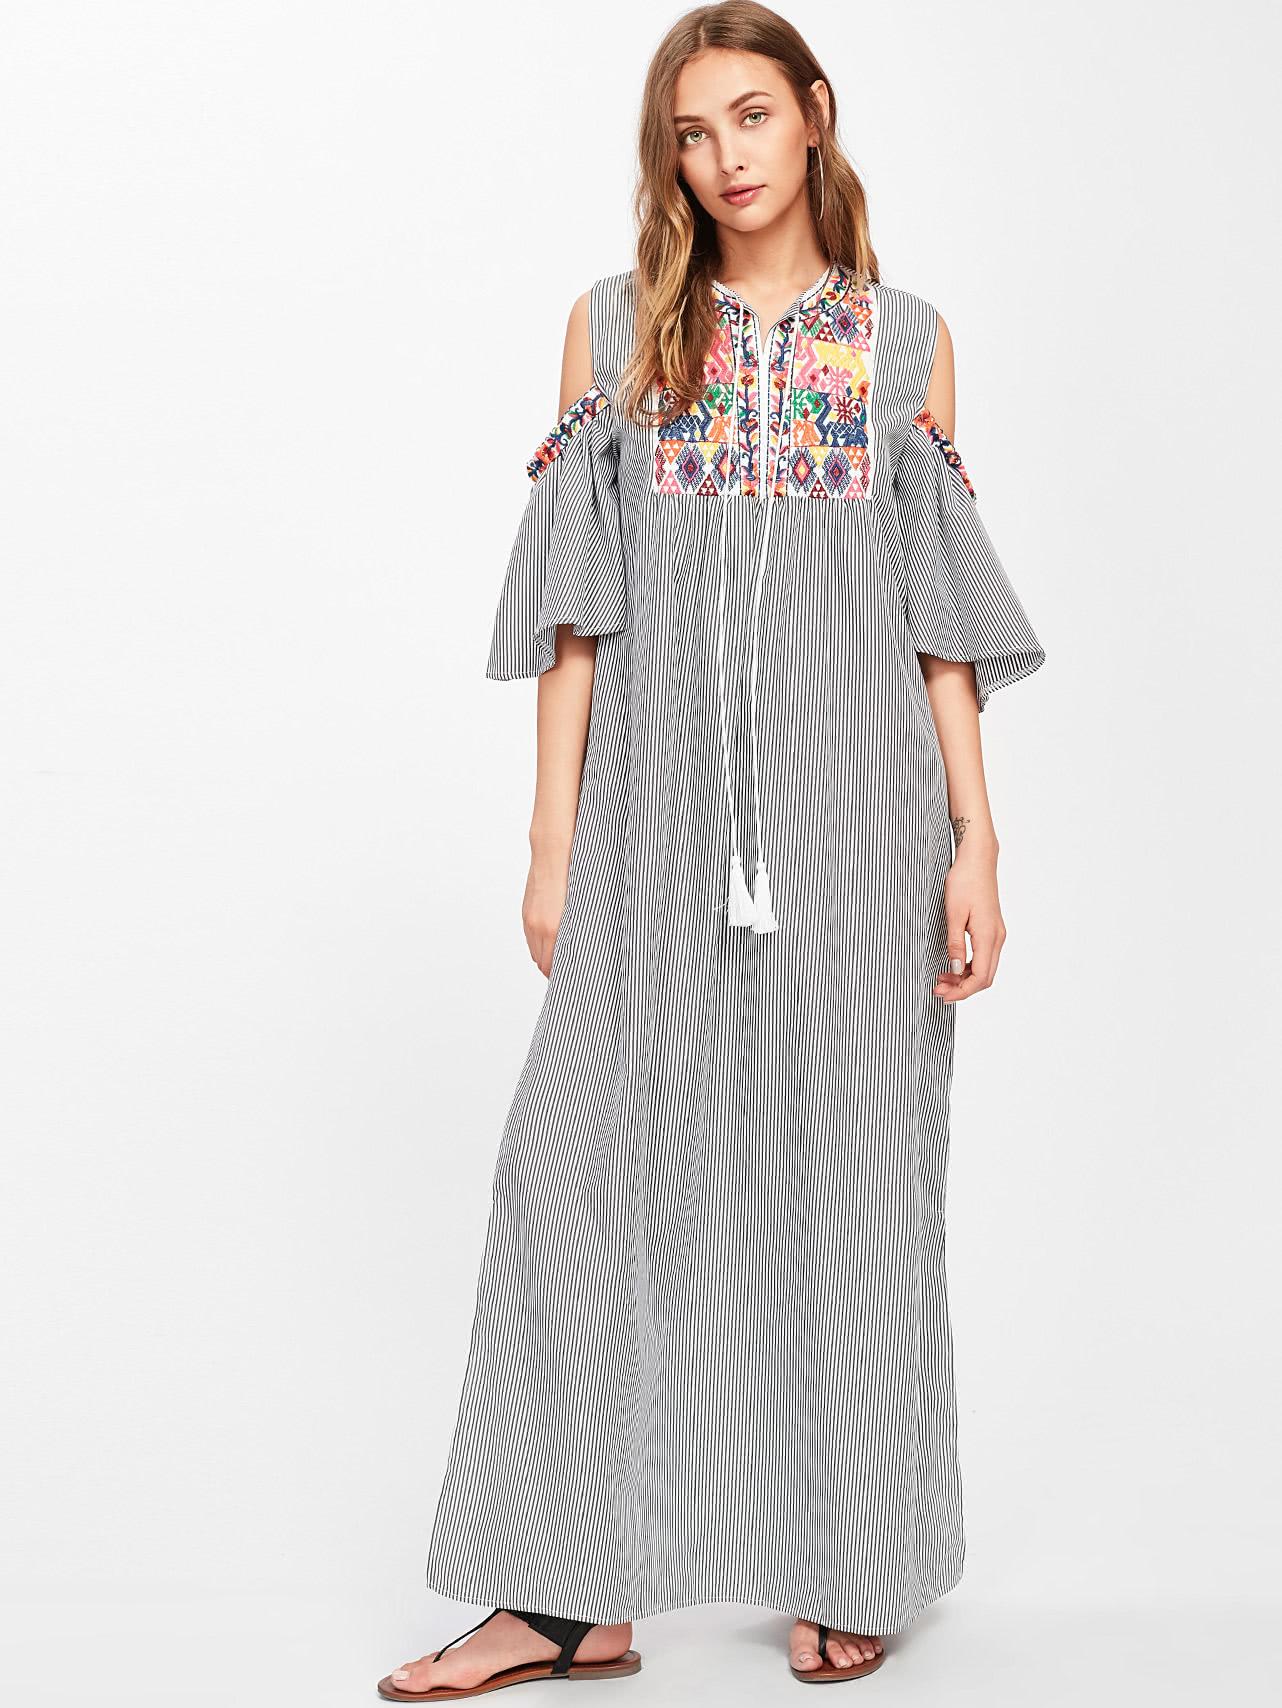 Aztec Embroidered Open Shoulder Tassel Tie Neck Pinstriped Dress dress170712030